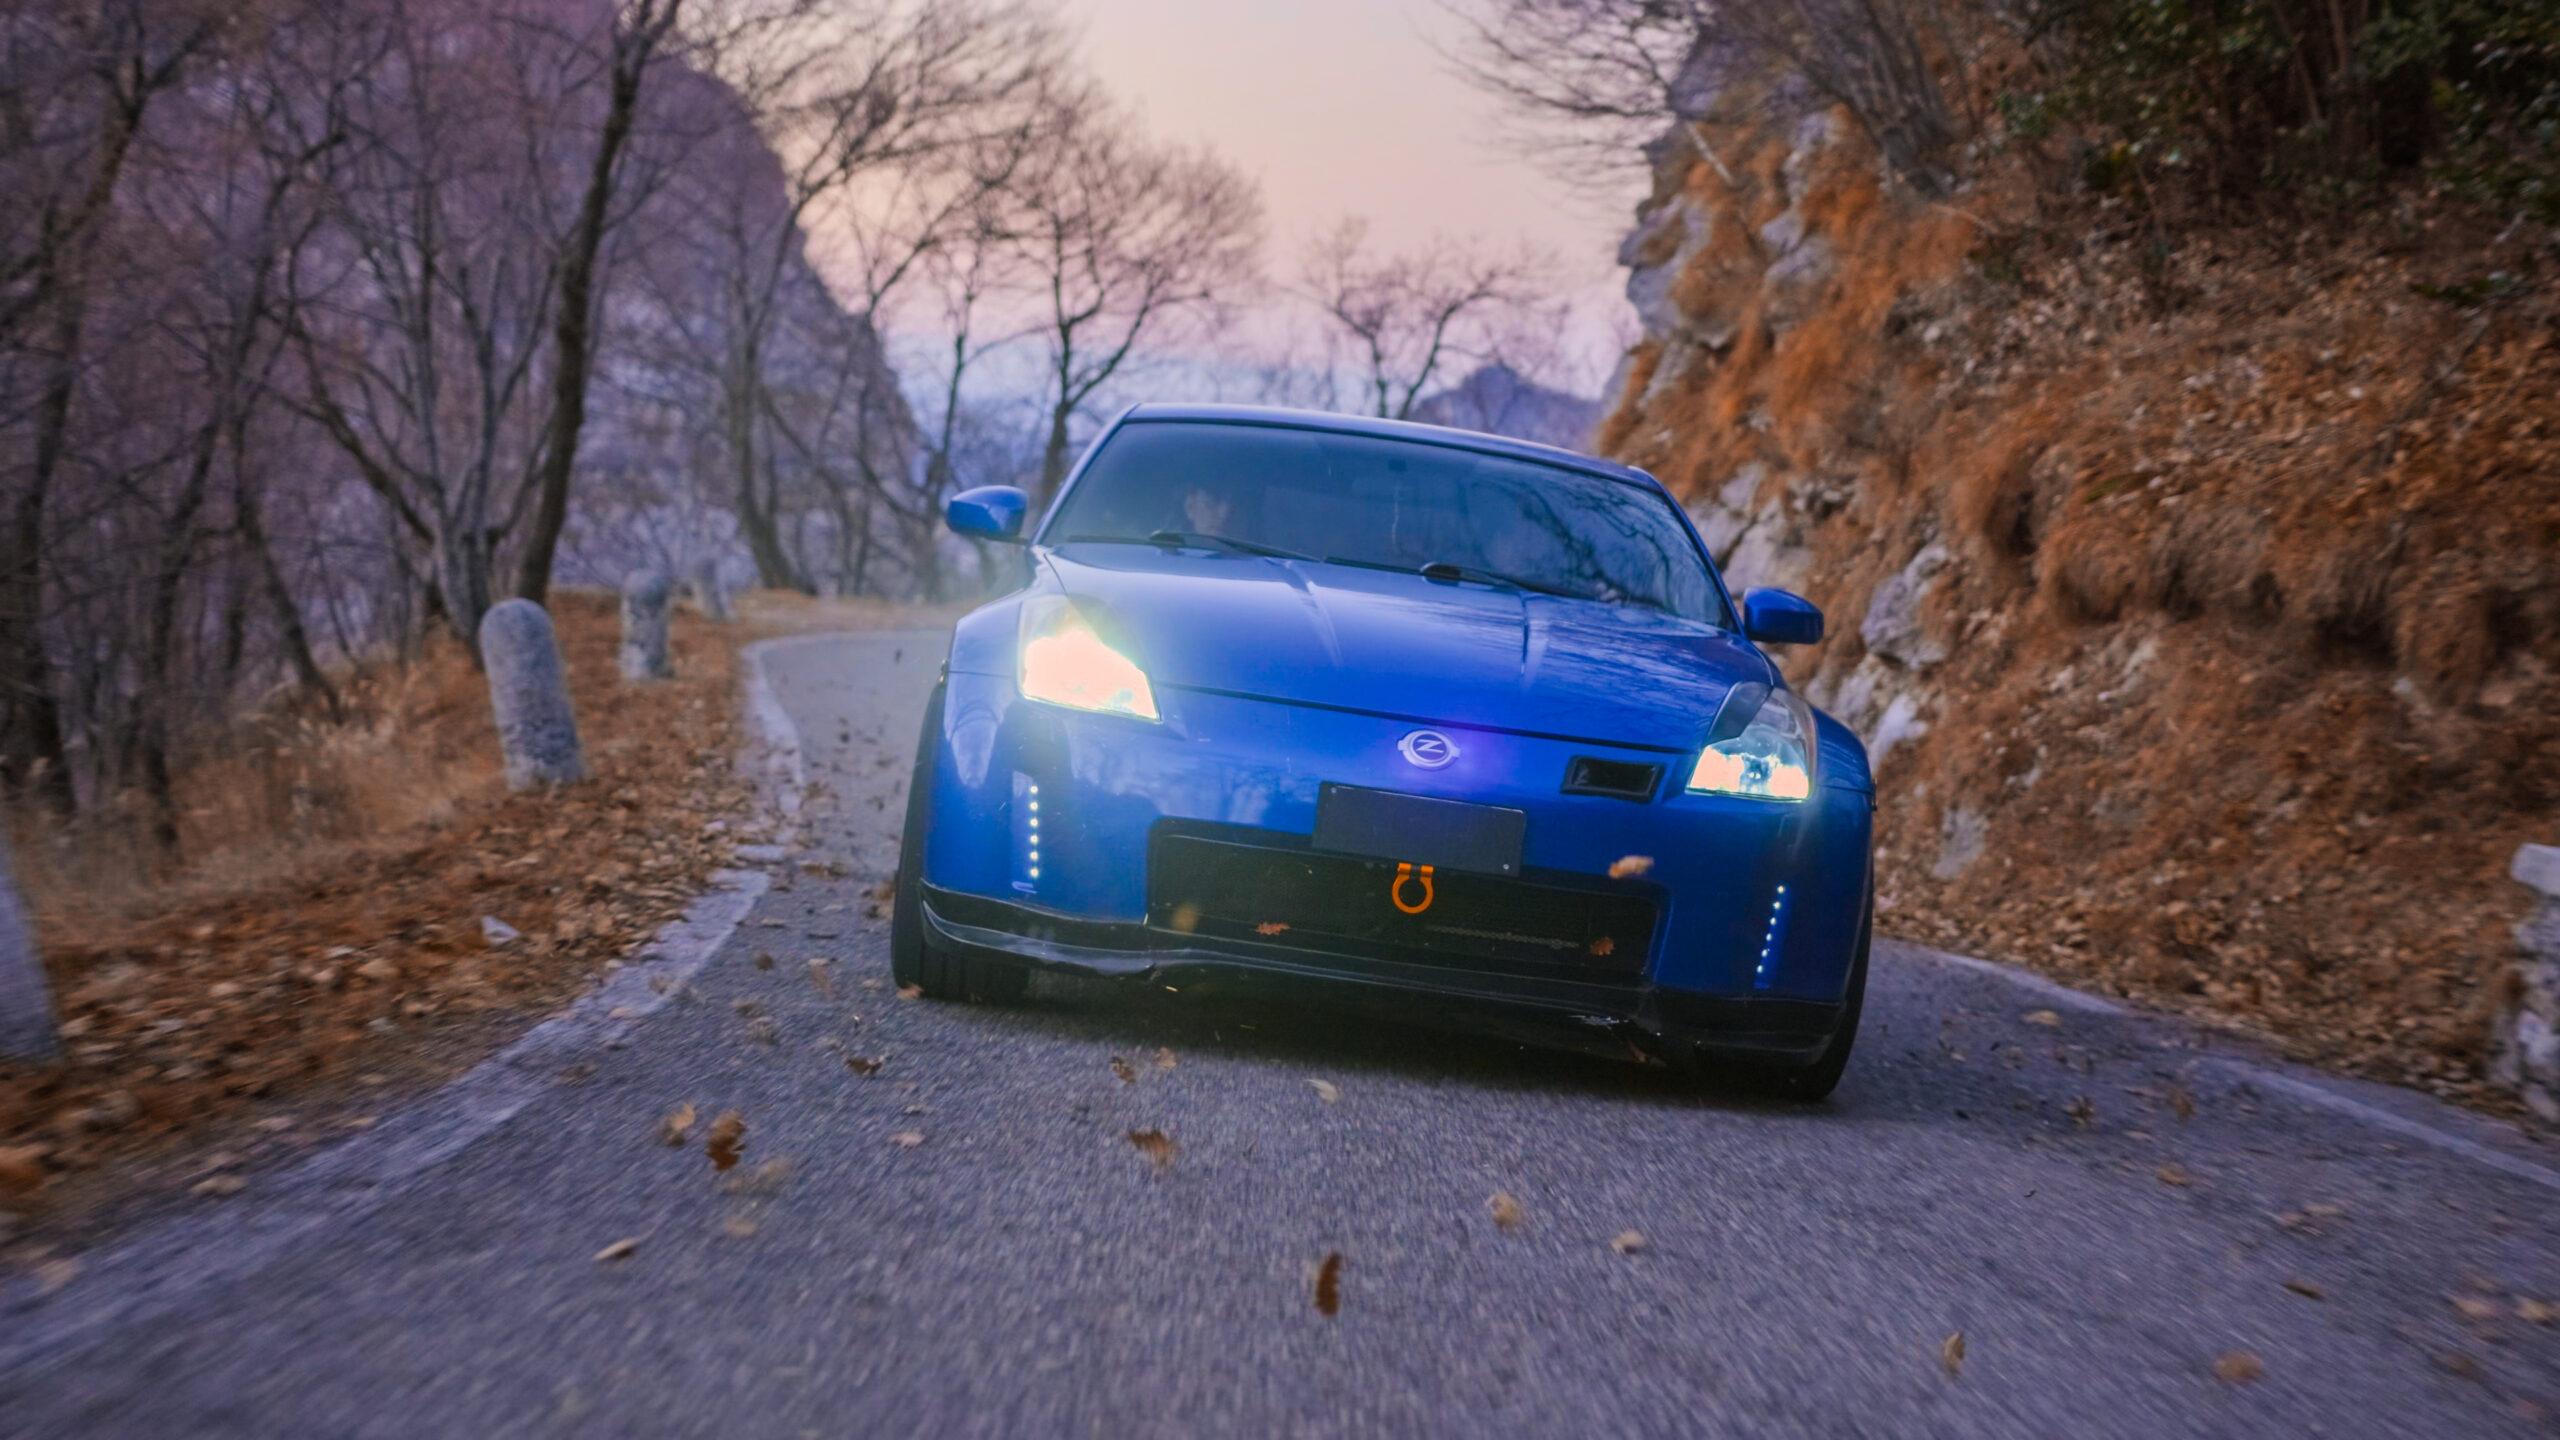 Japan racing, Lecco, Morterone, Matteo Colombo, automobile, Nissan 350z